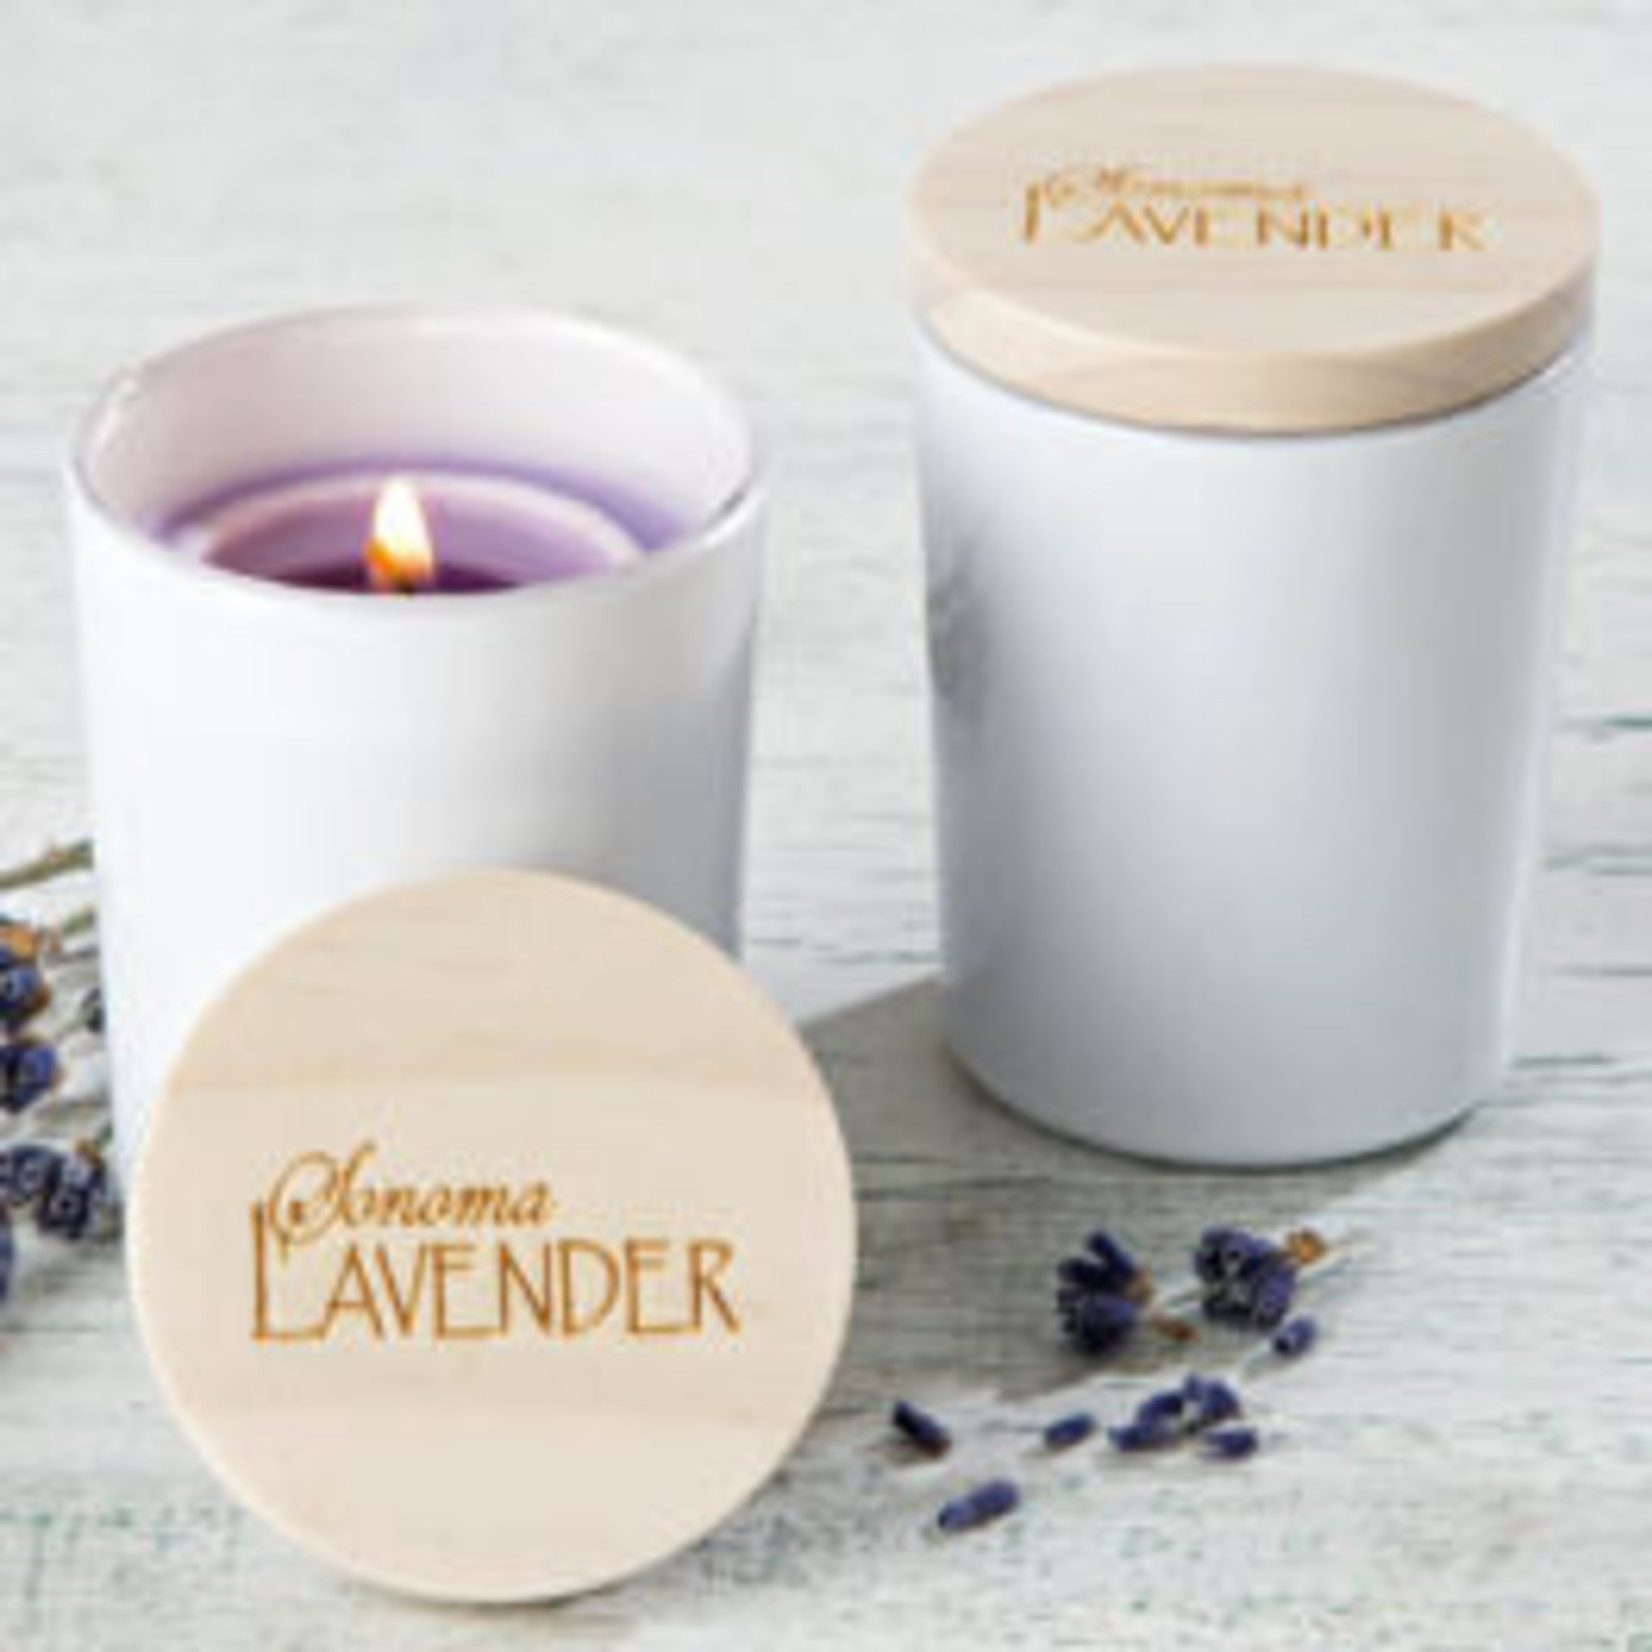 Sonoma Lavender Soy Votive in Ceramic Jar w/Wood Lid